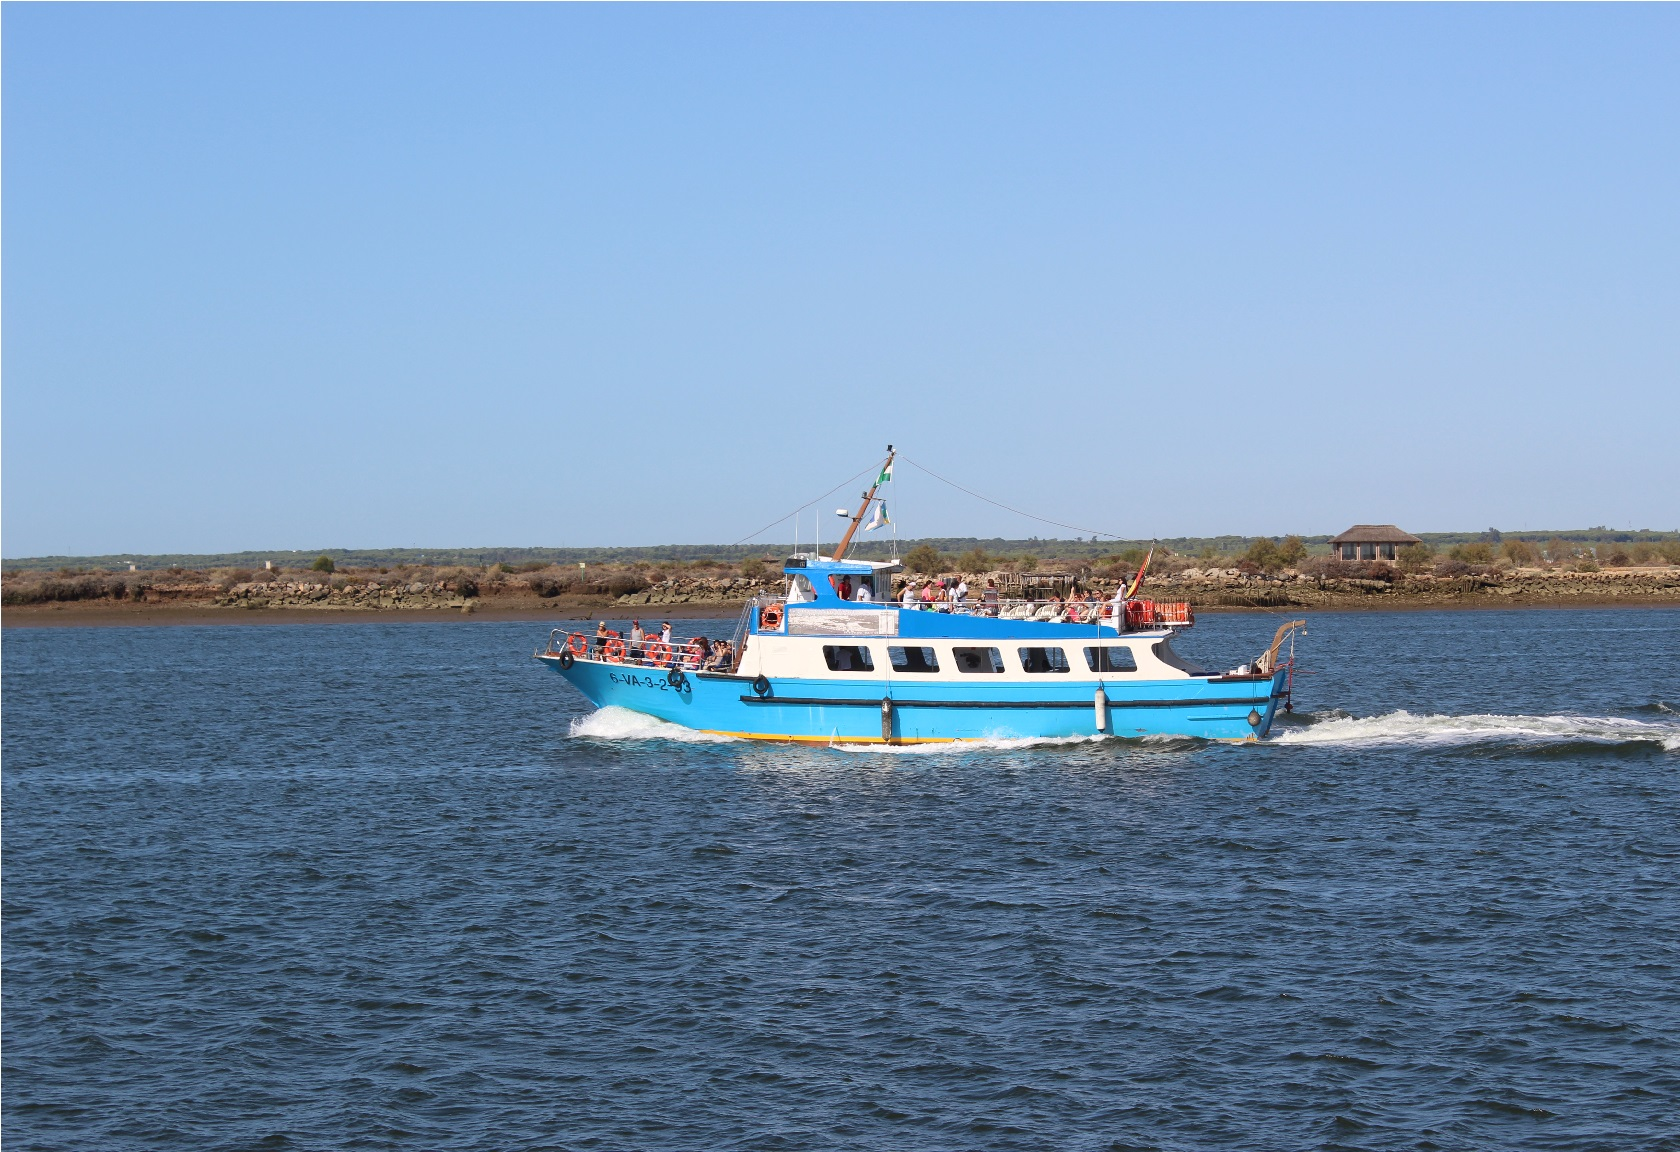 Canoa de Punta Umbría3 / M. Bautista